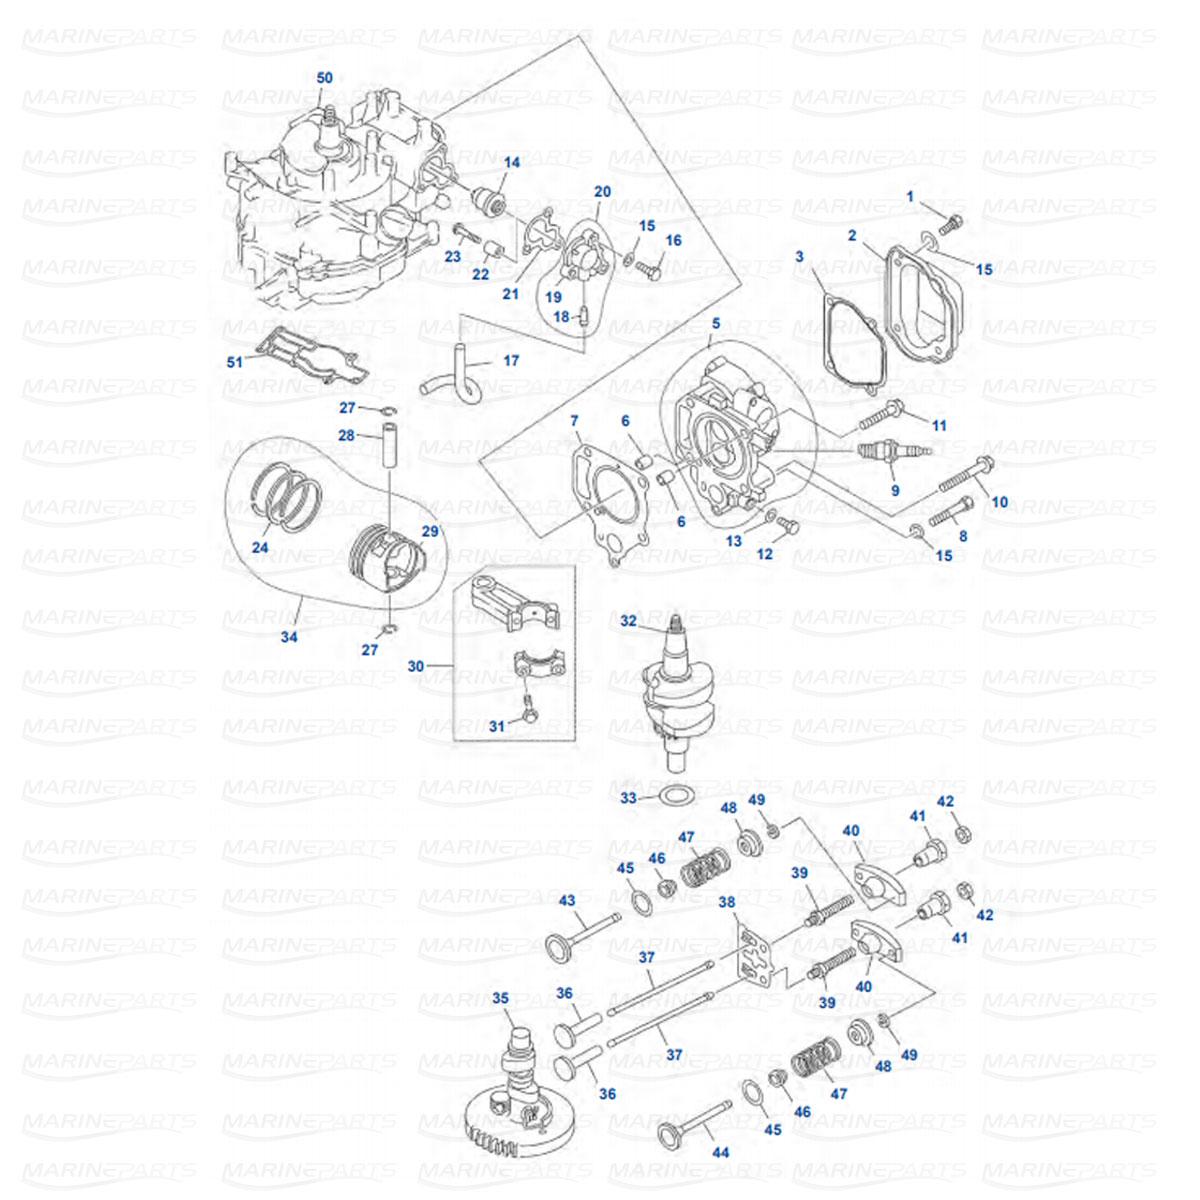 Yamaha engine parts for outboard motor, marineparts.eu